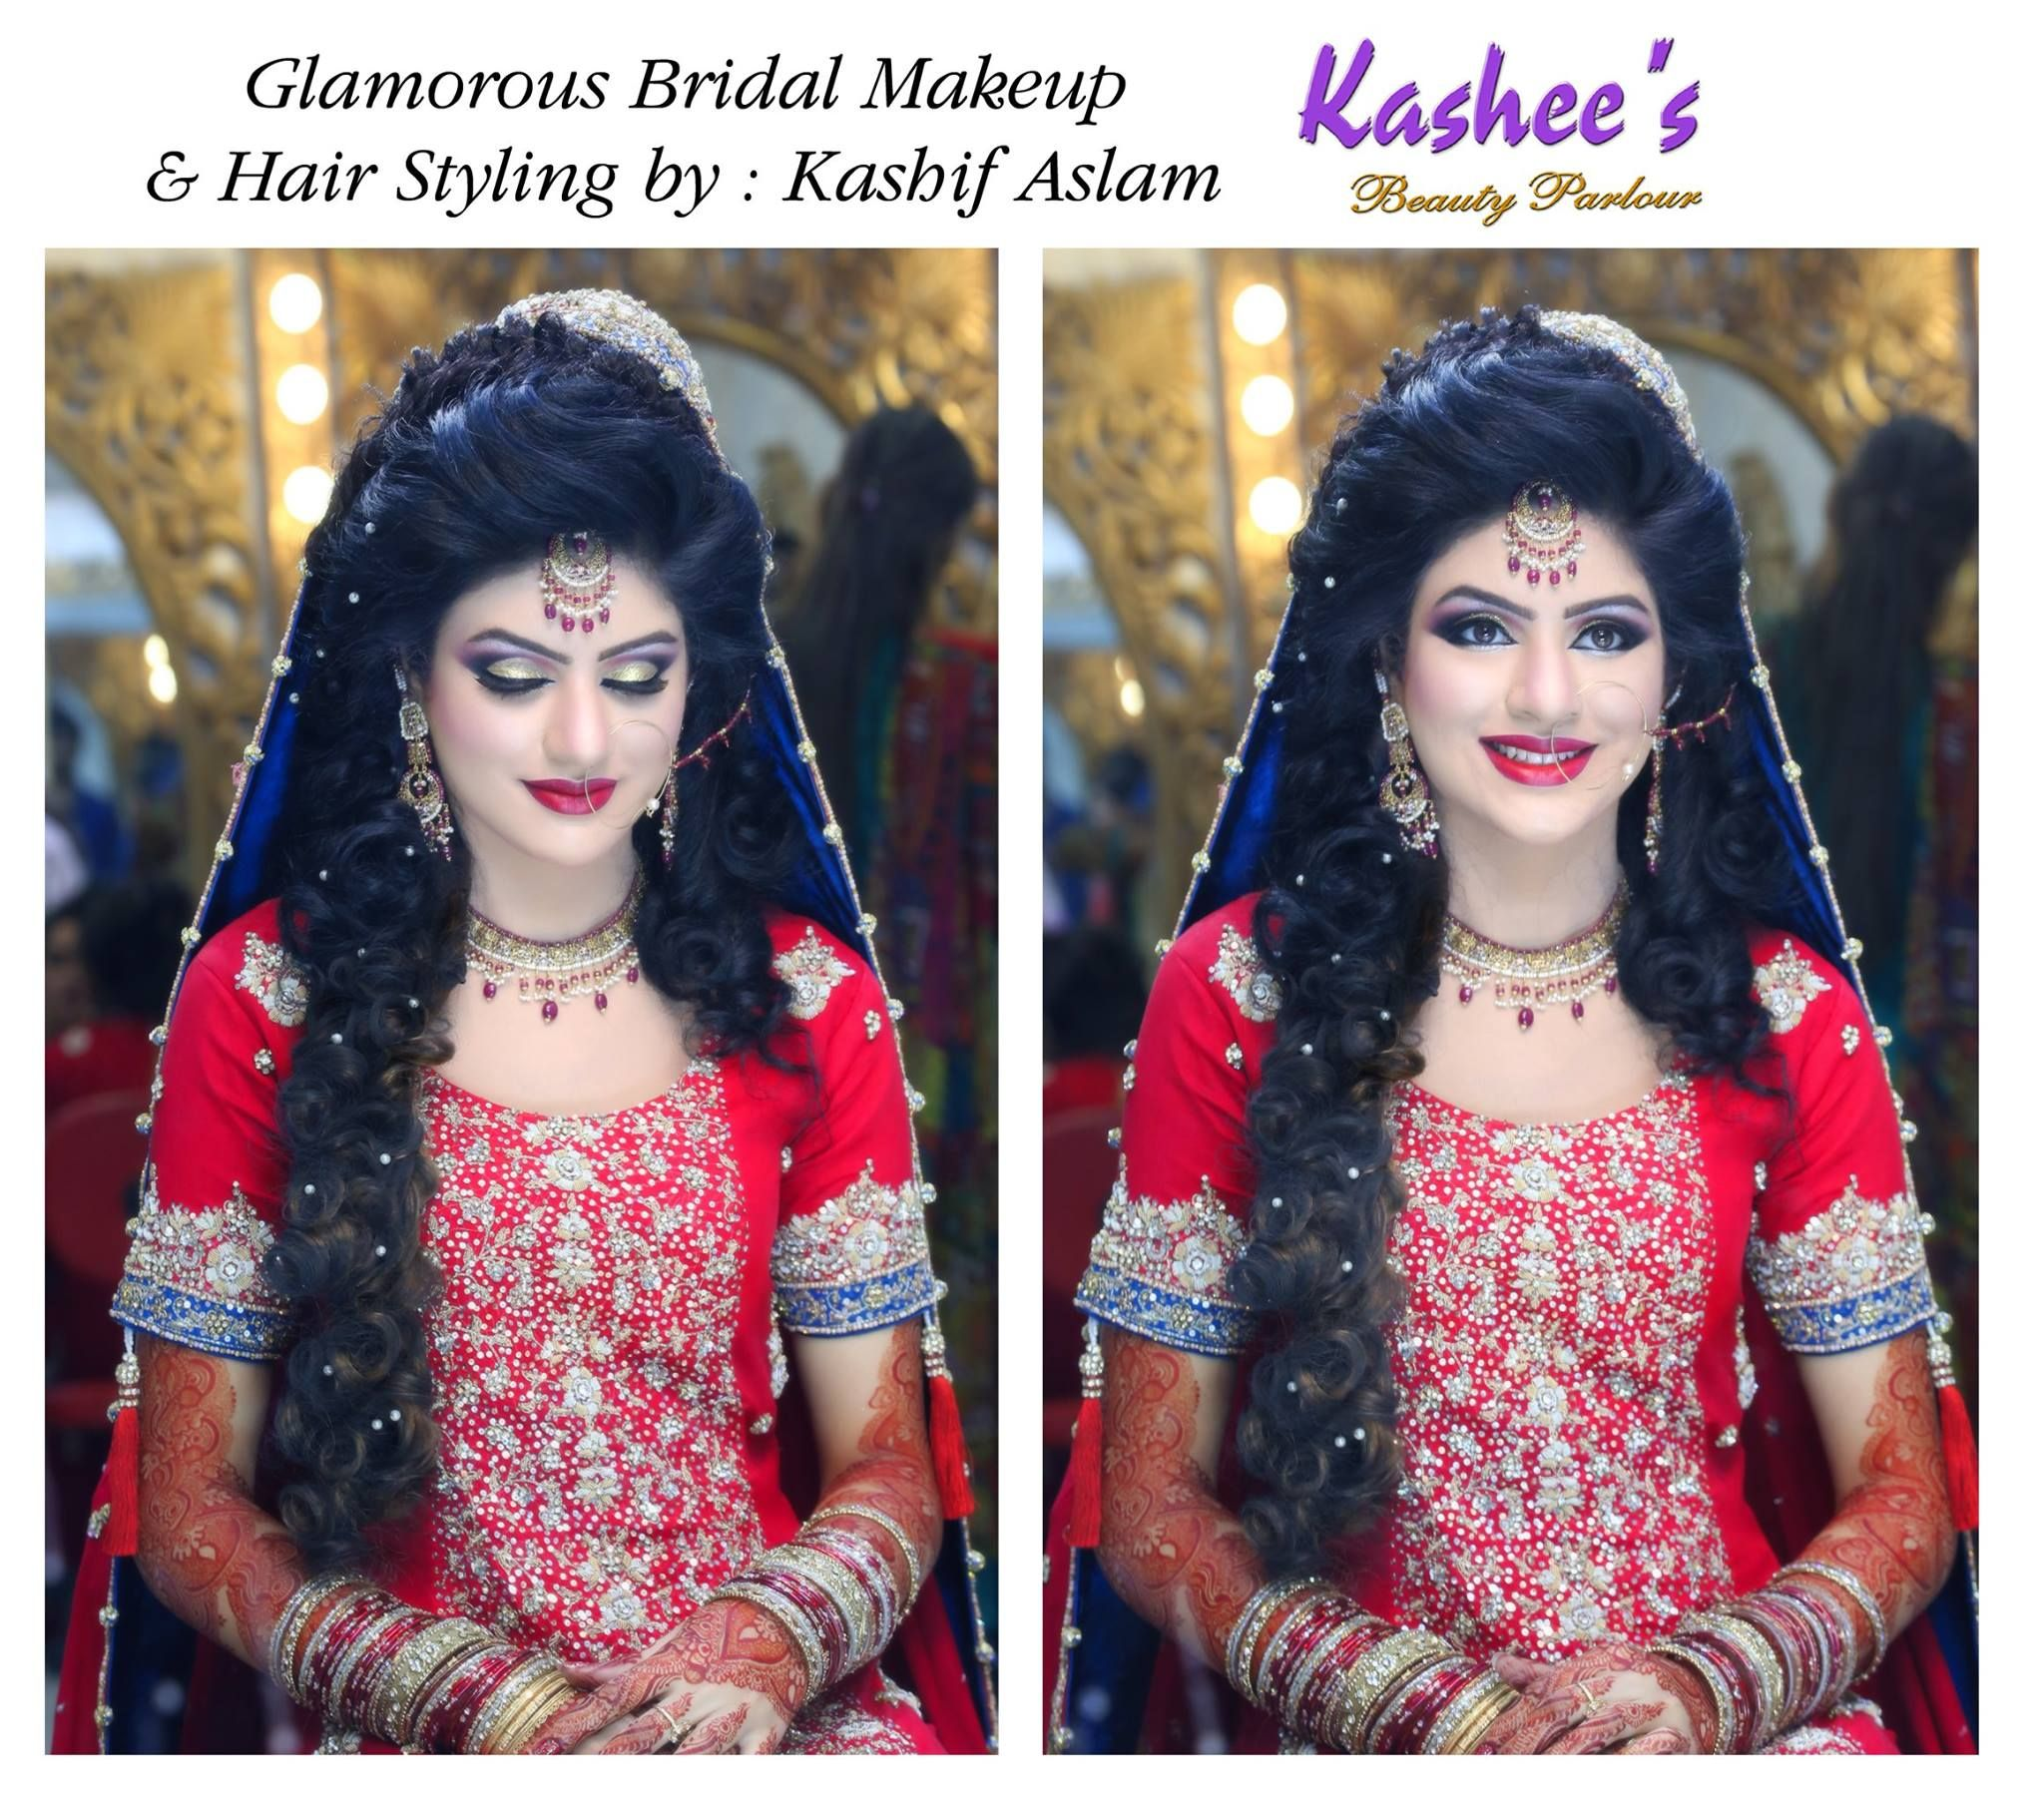 Glamorous bridal makeup and hair styling by kashif aslam ...